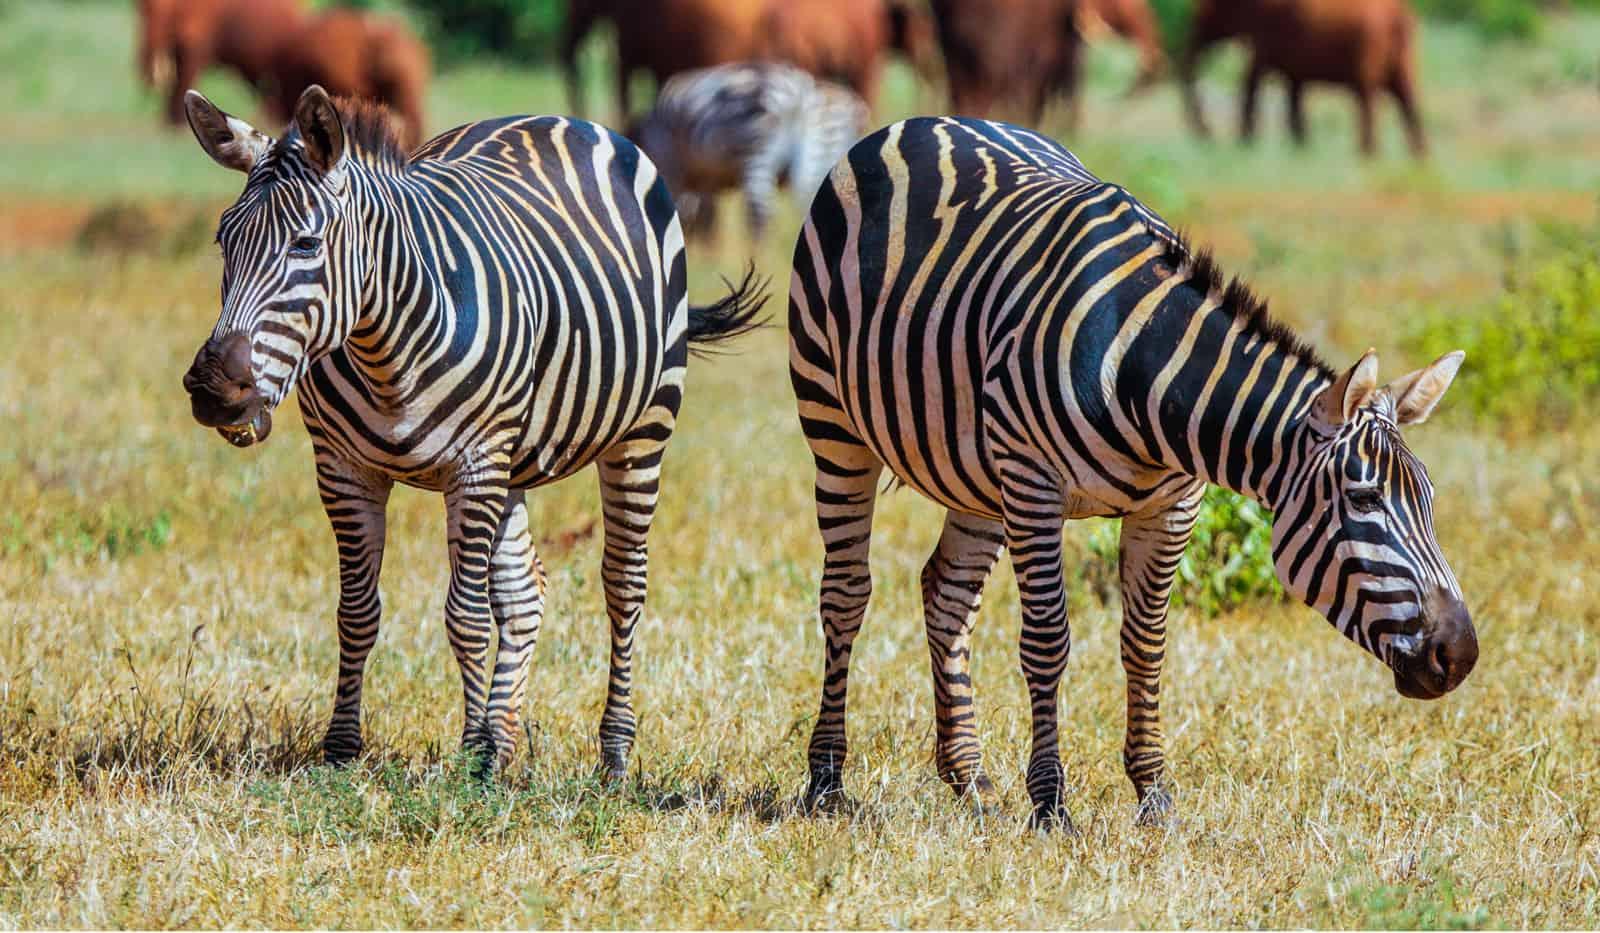 Diani Safari Tours Julius Tours Mombasa Safari Tours Kenya 2